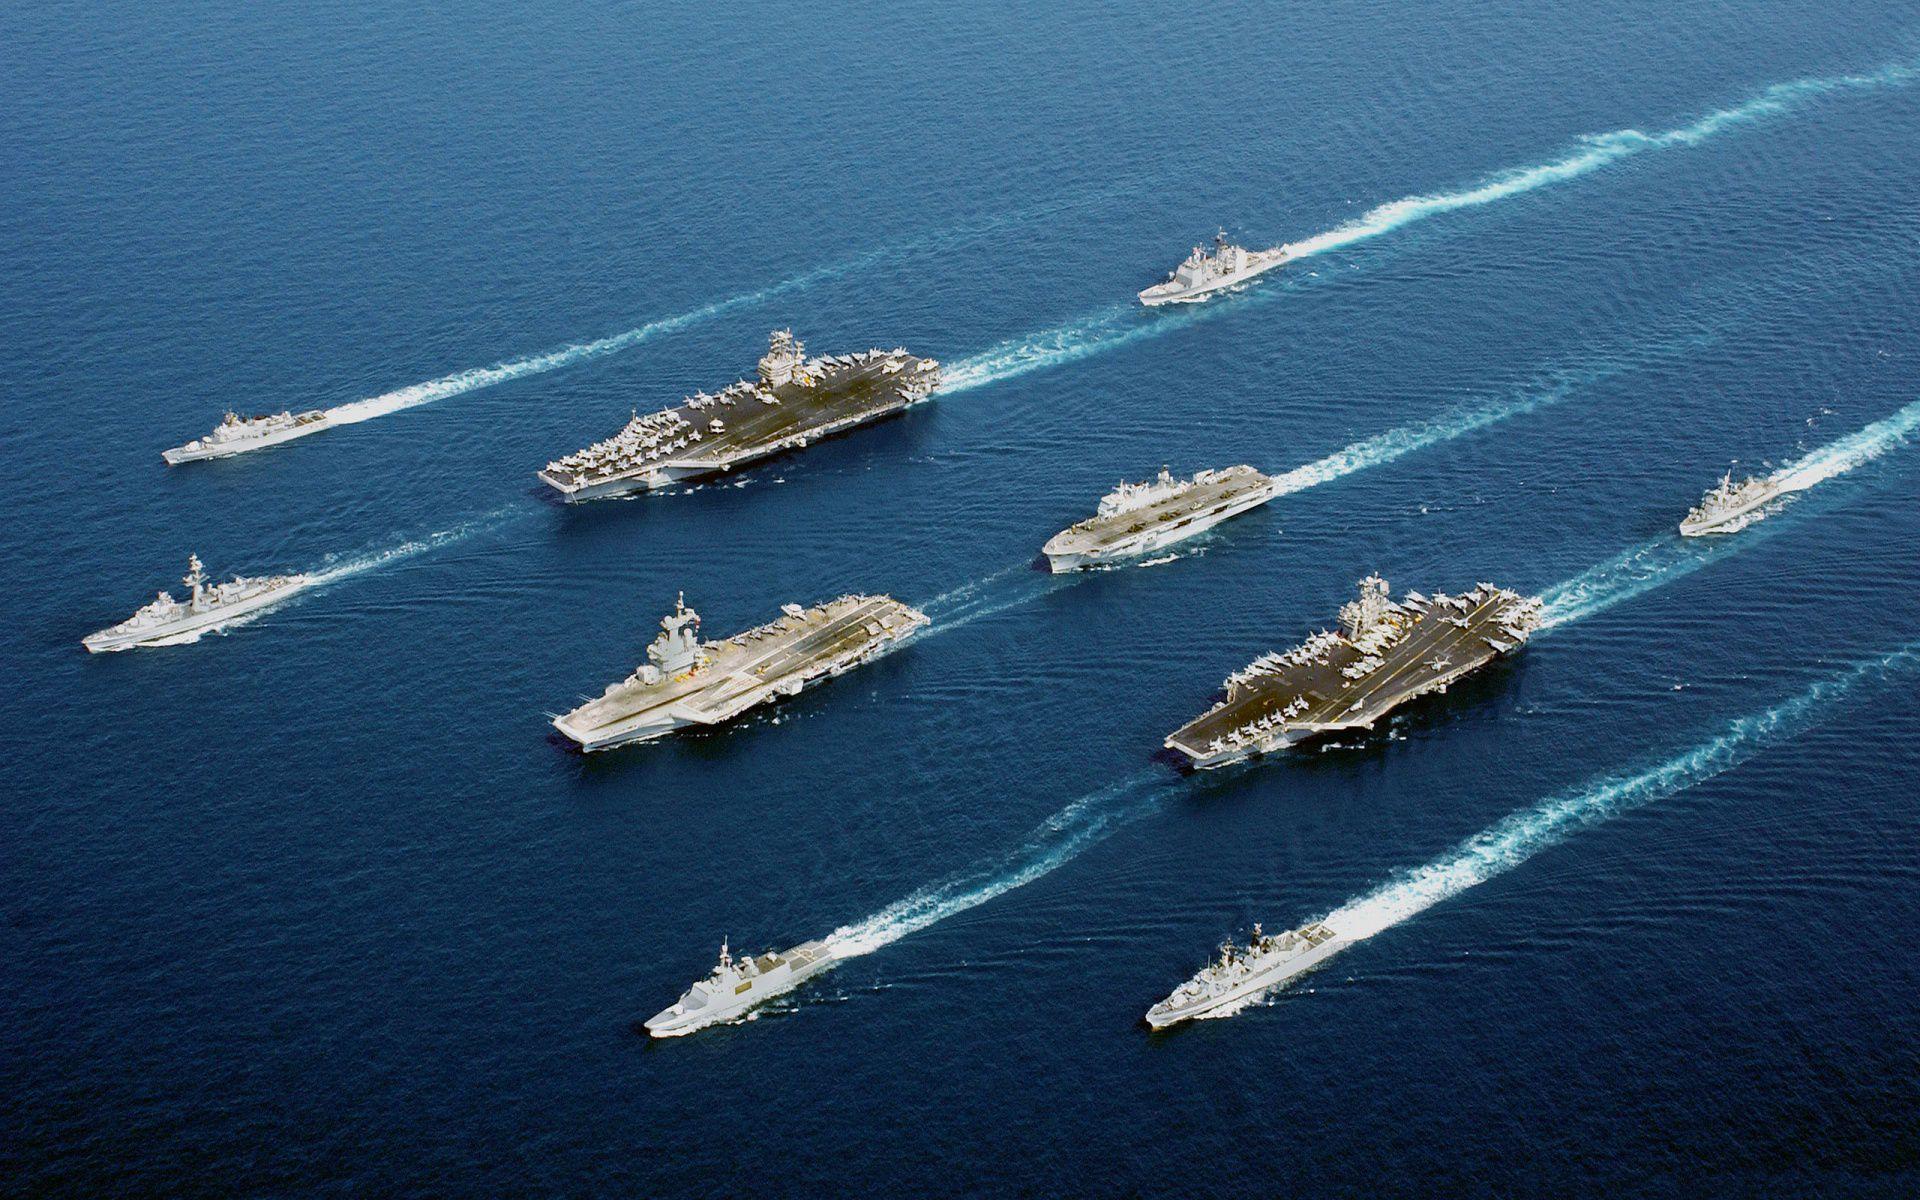 united states navy fleet military transport Wallpaper Military 1920x1200